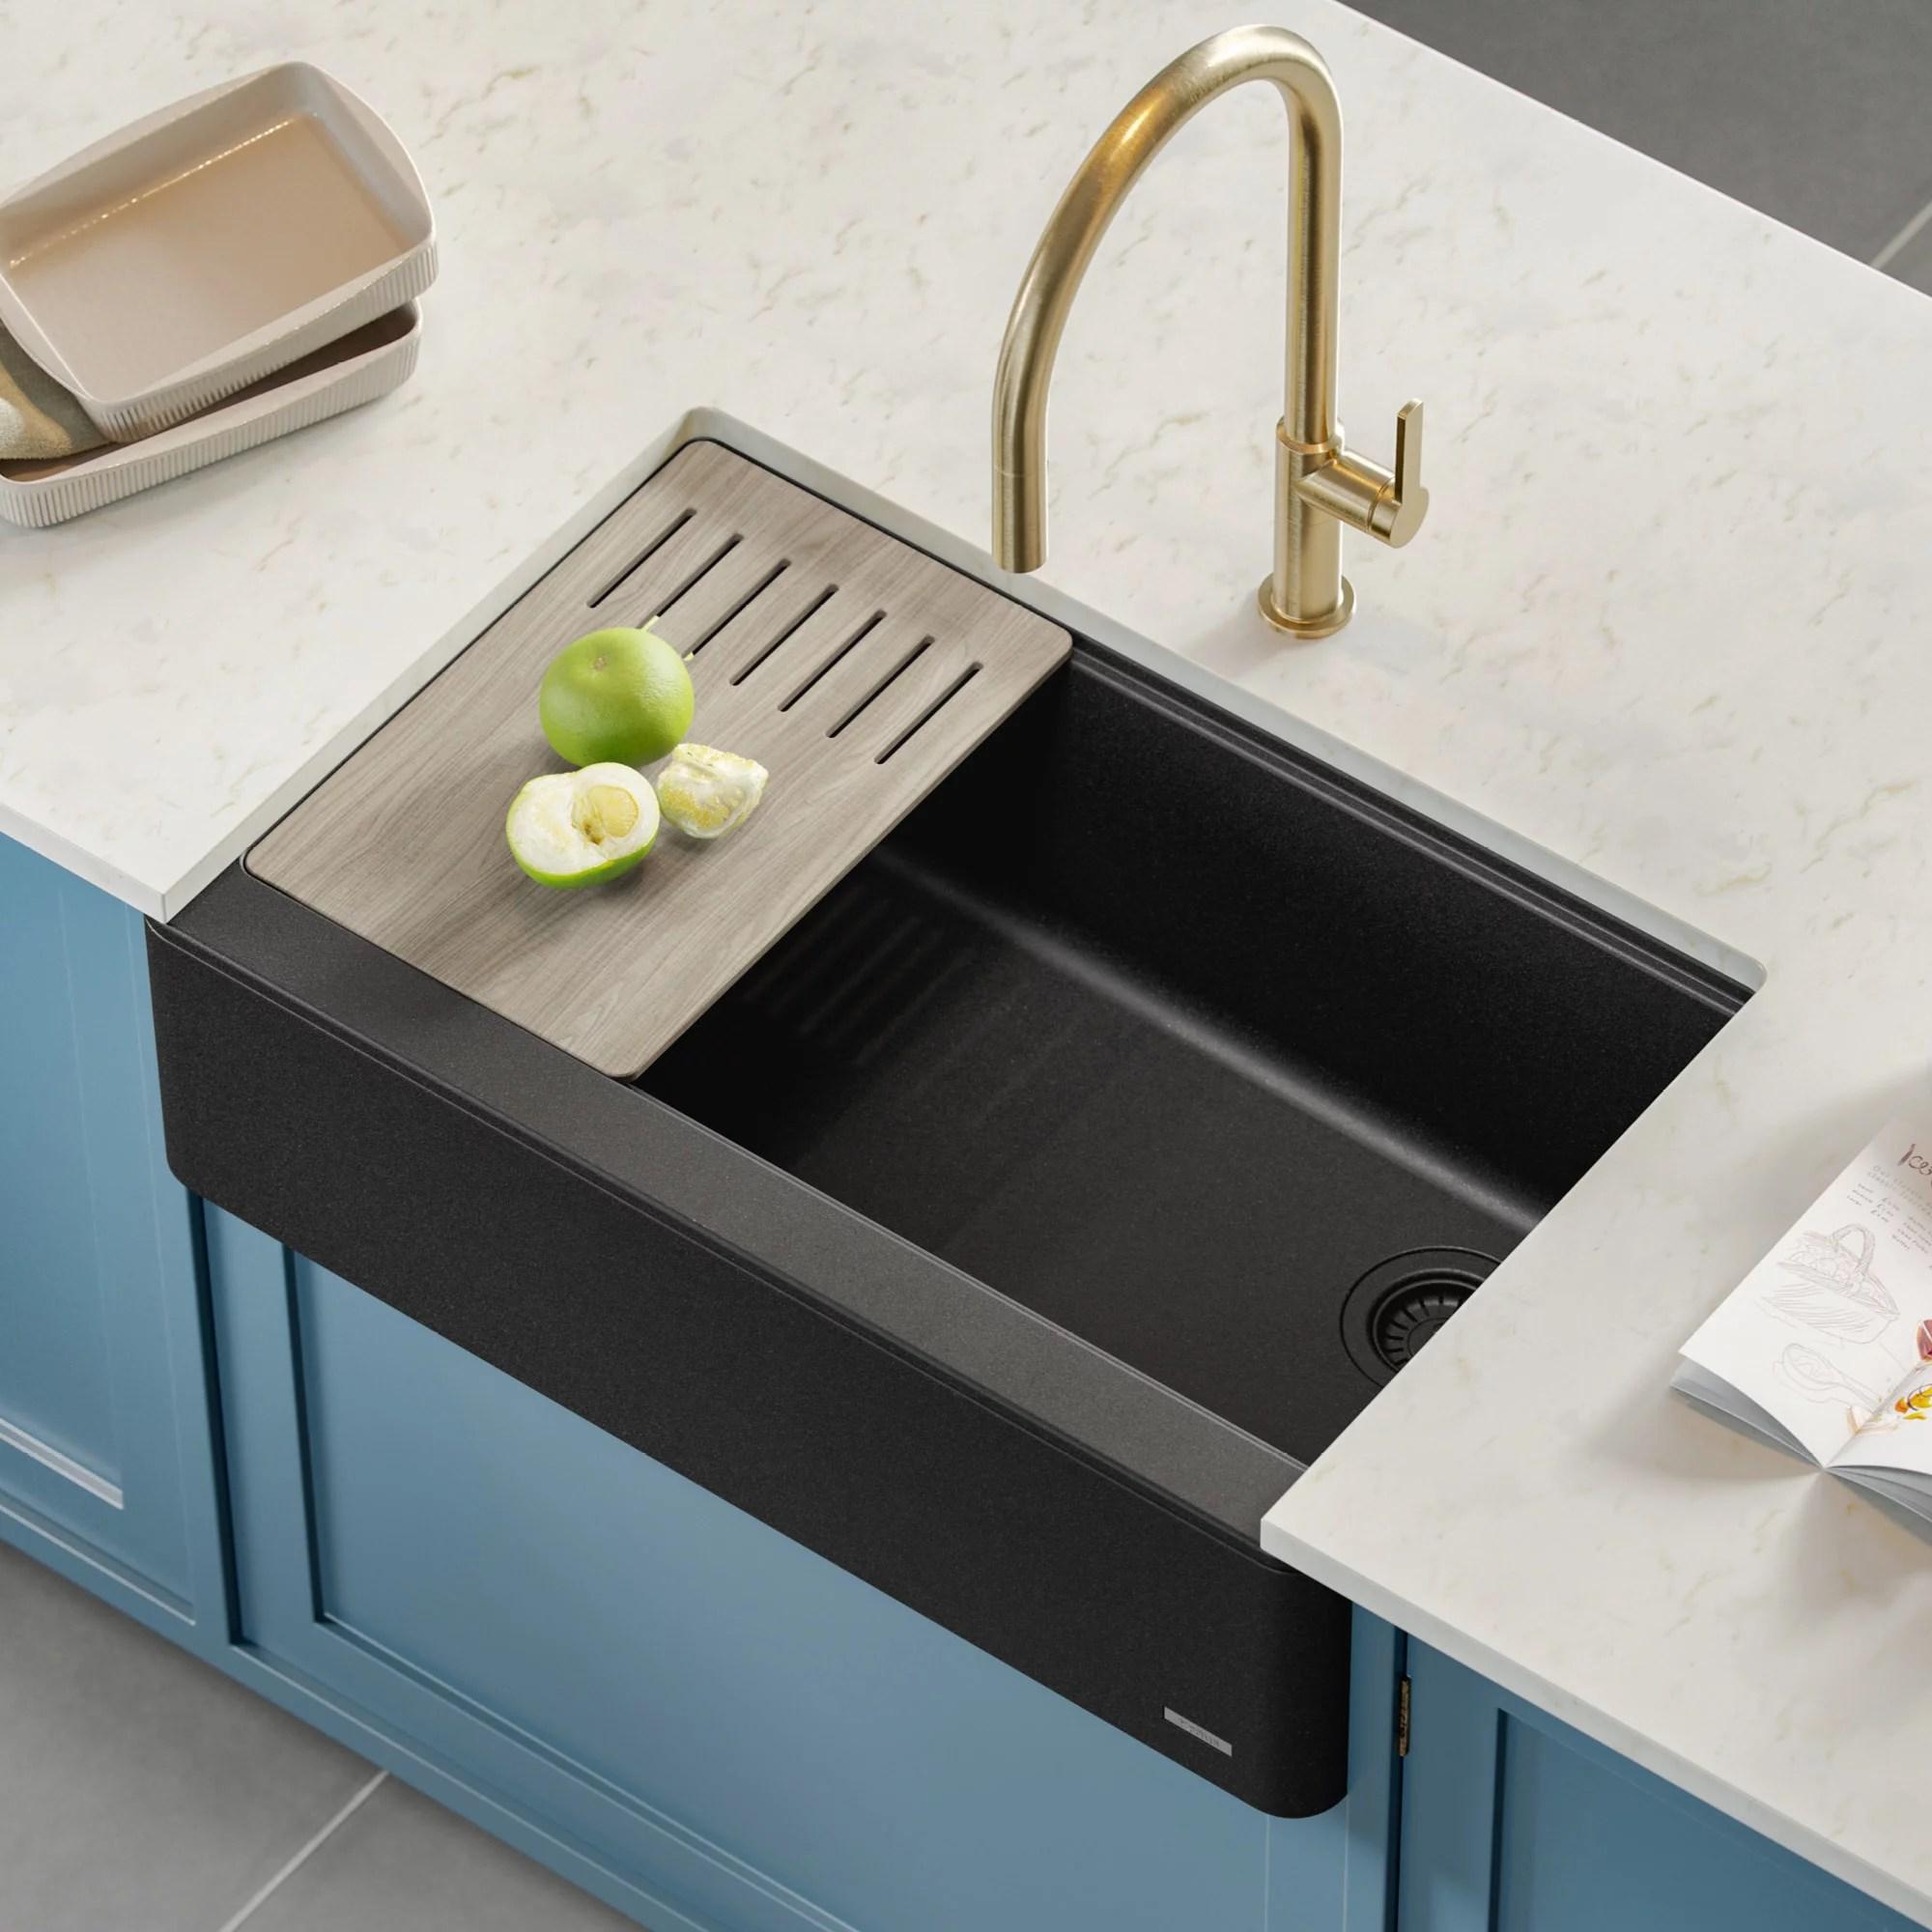 kraus bellucci workstation 33 quartz composite single bowl farmhouse kitchen sink in metallic black walmart com